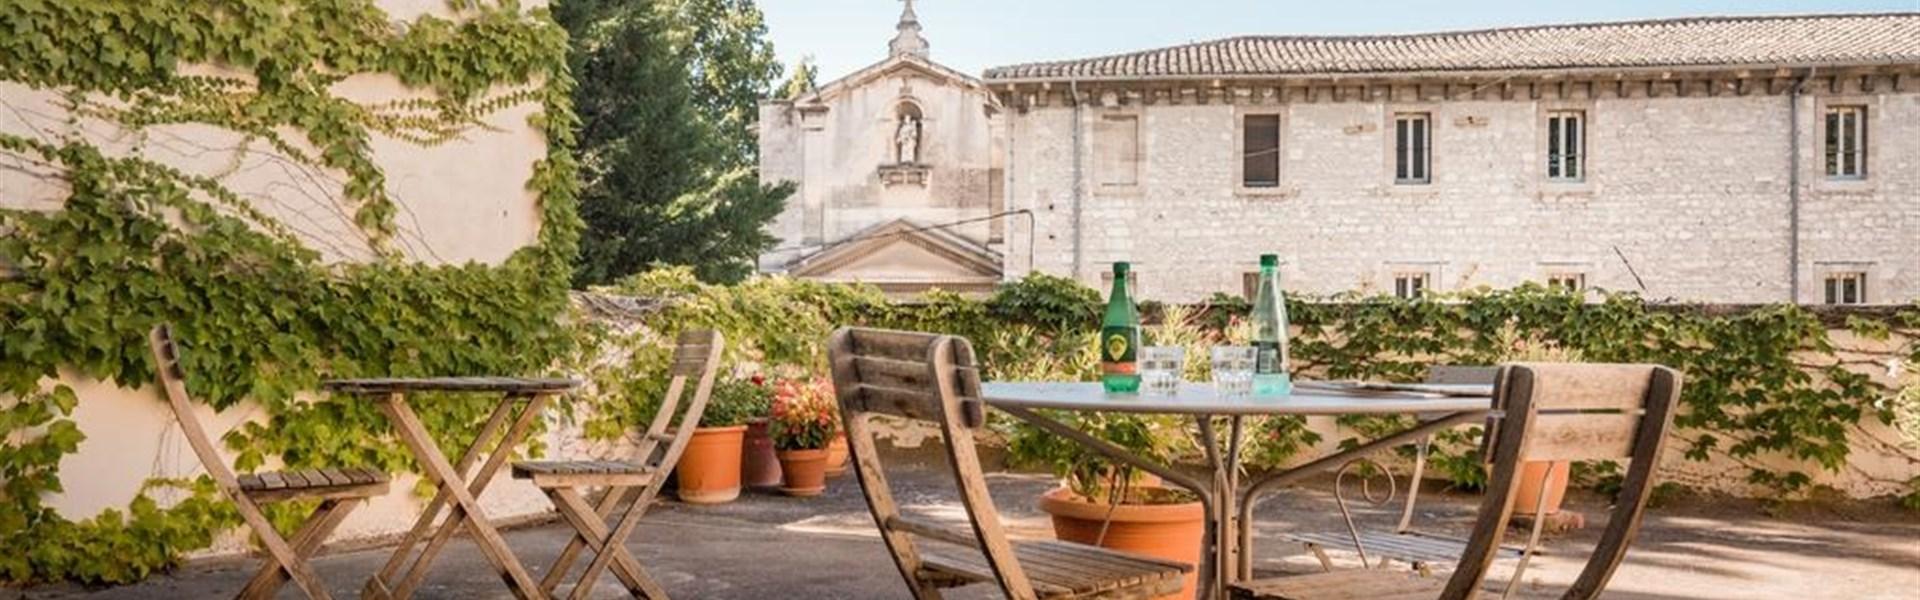 Marco Polo - Avignon Hotel D'Angleterre -